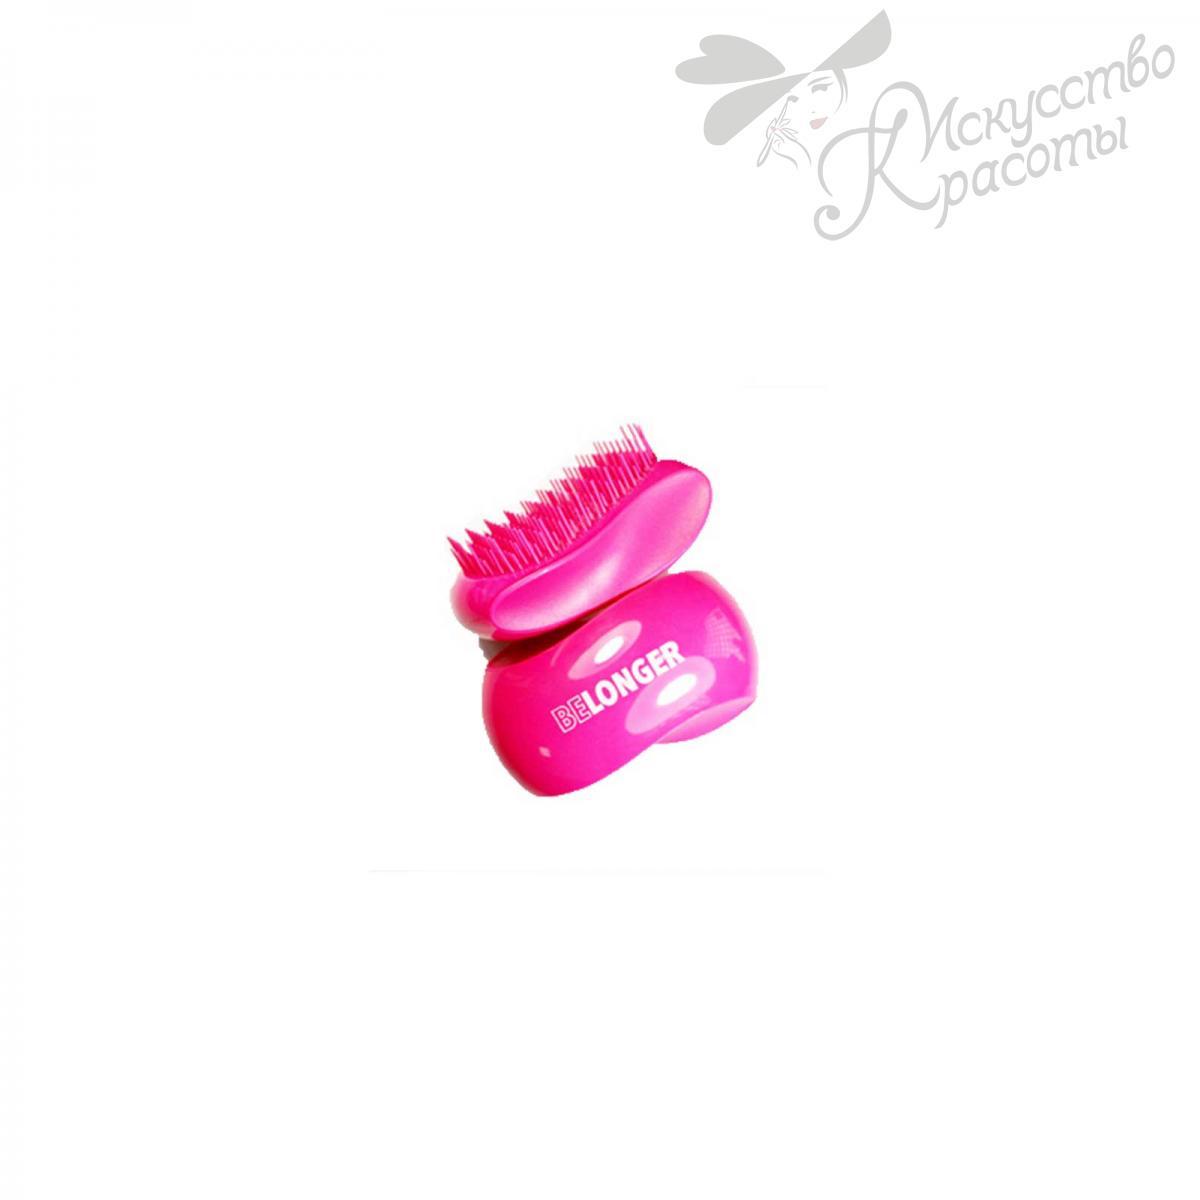 Щетка для волос ID Hair  Belonger Detangling Brush